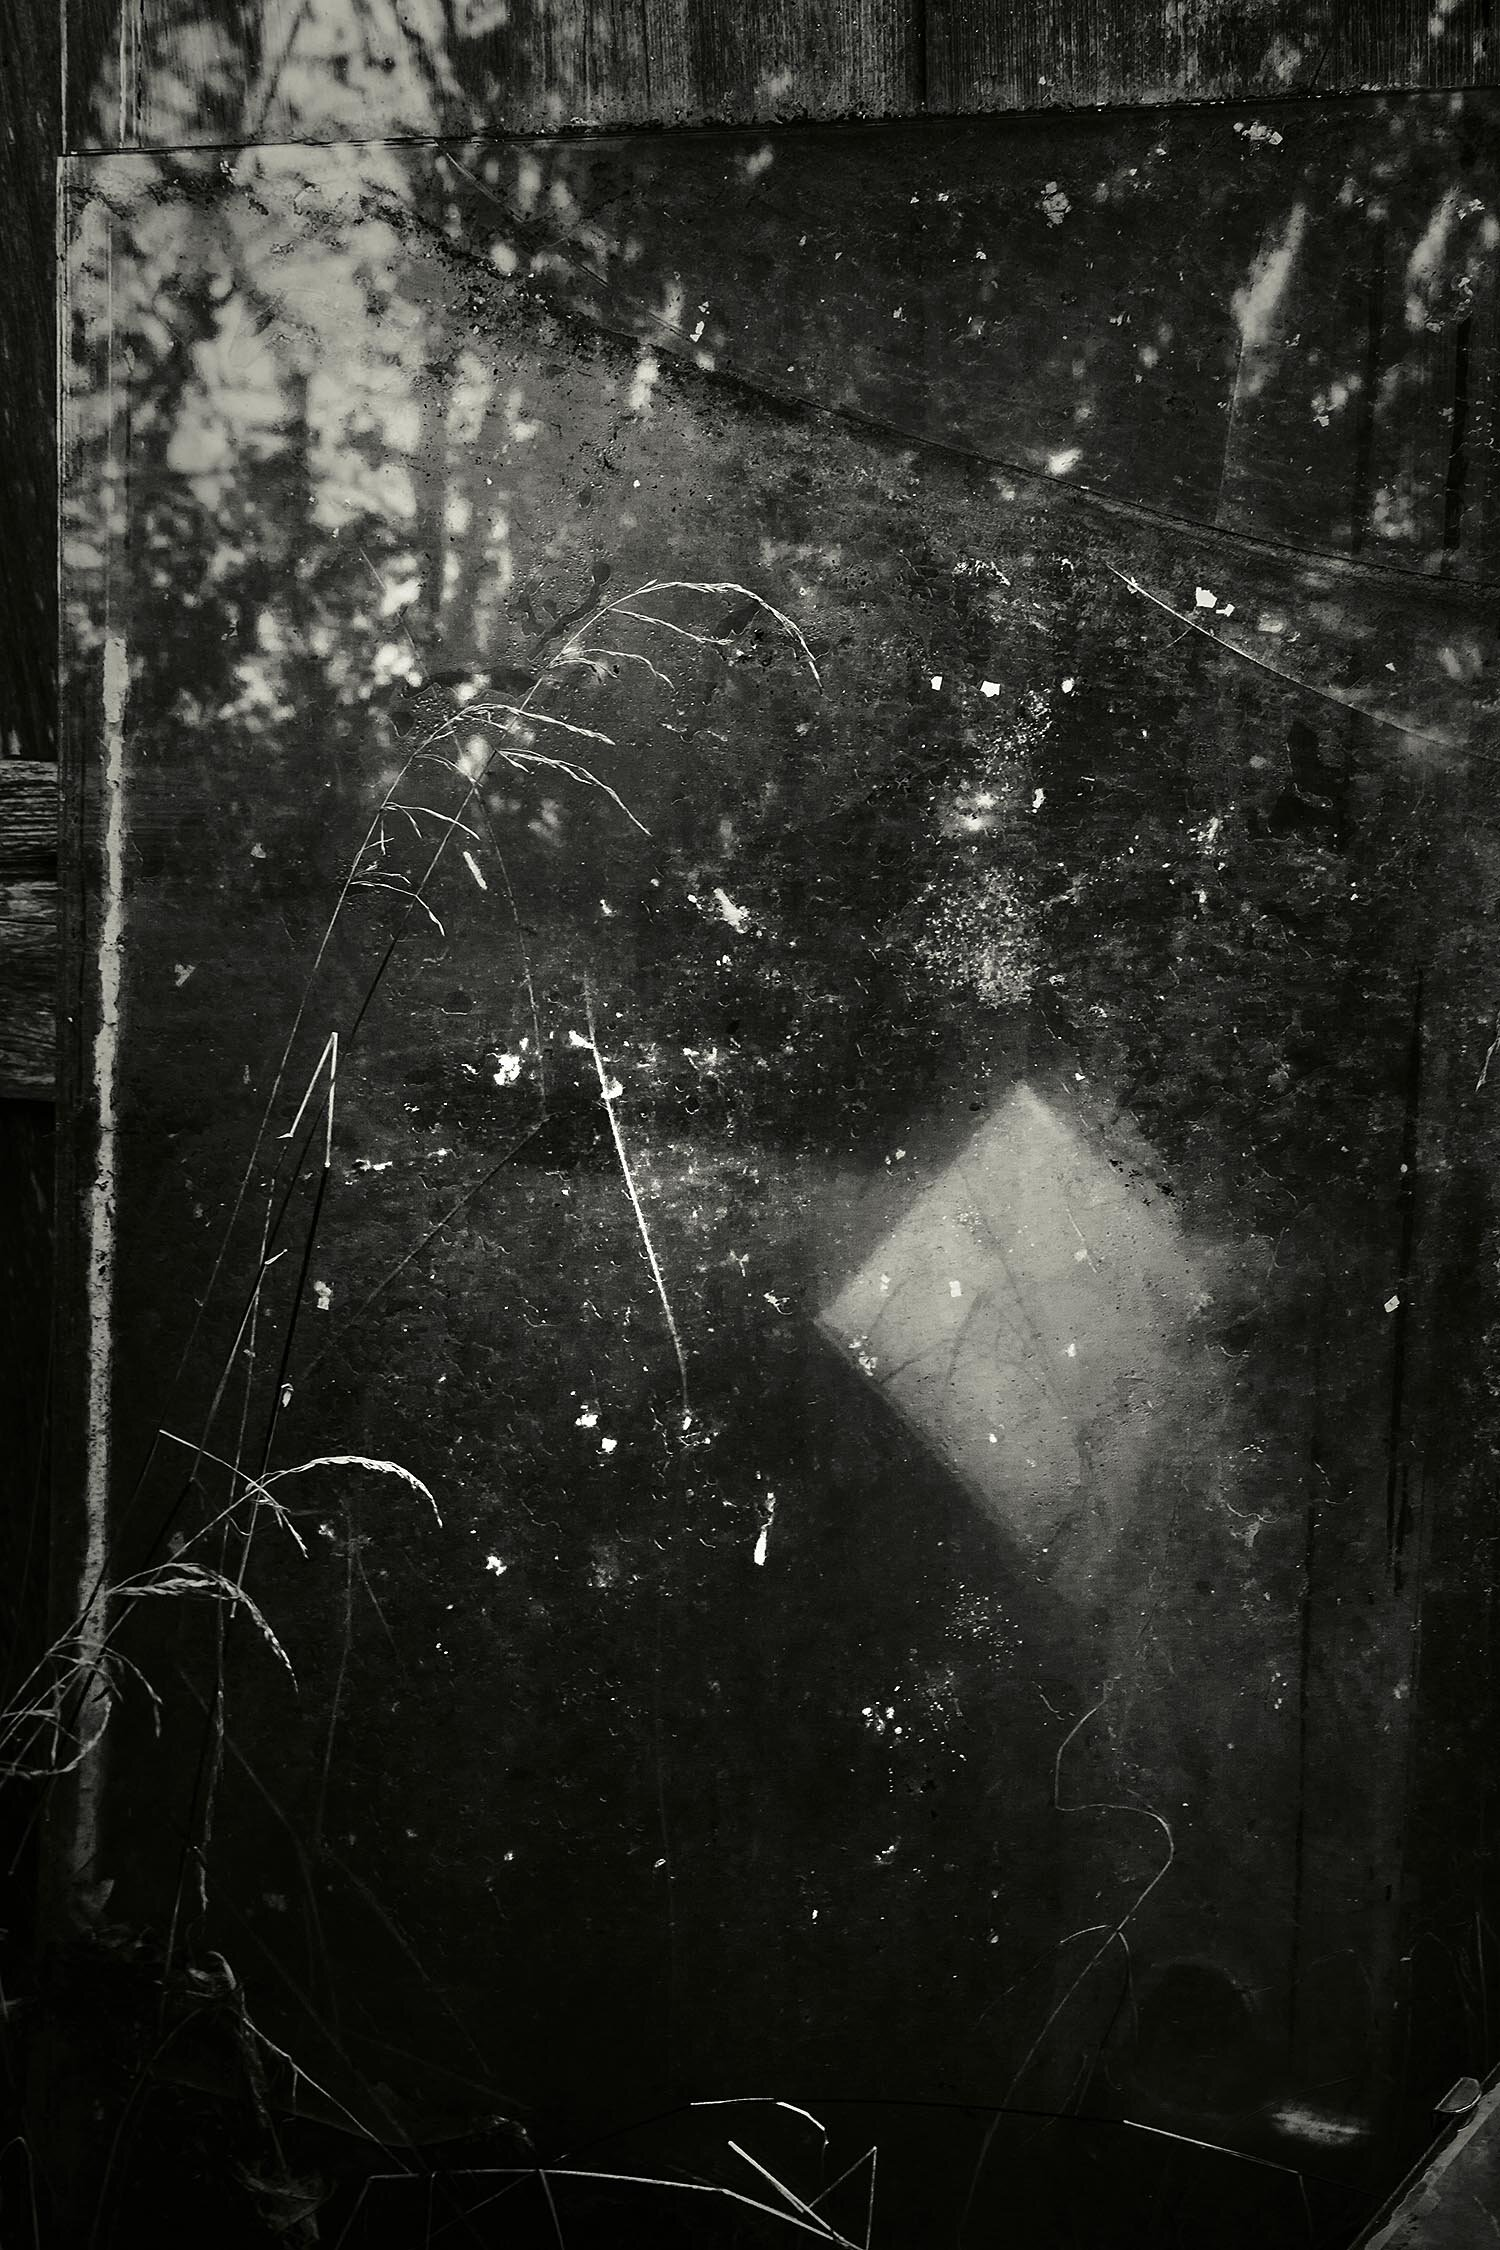 Weeds, Glass, Shed, Bar Harbor, Maine, 2010